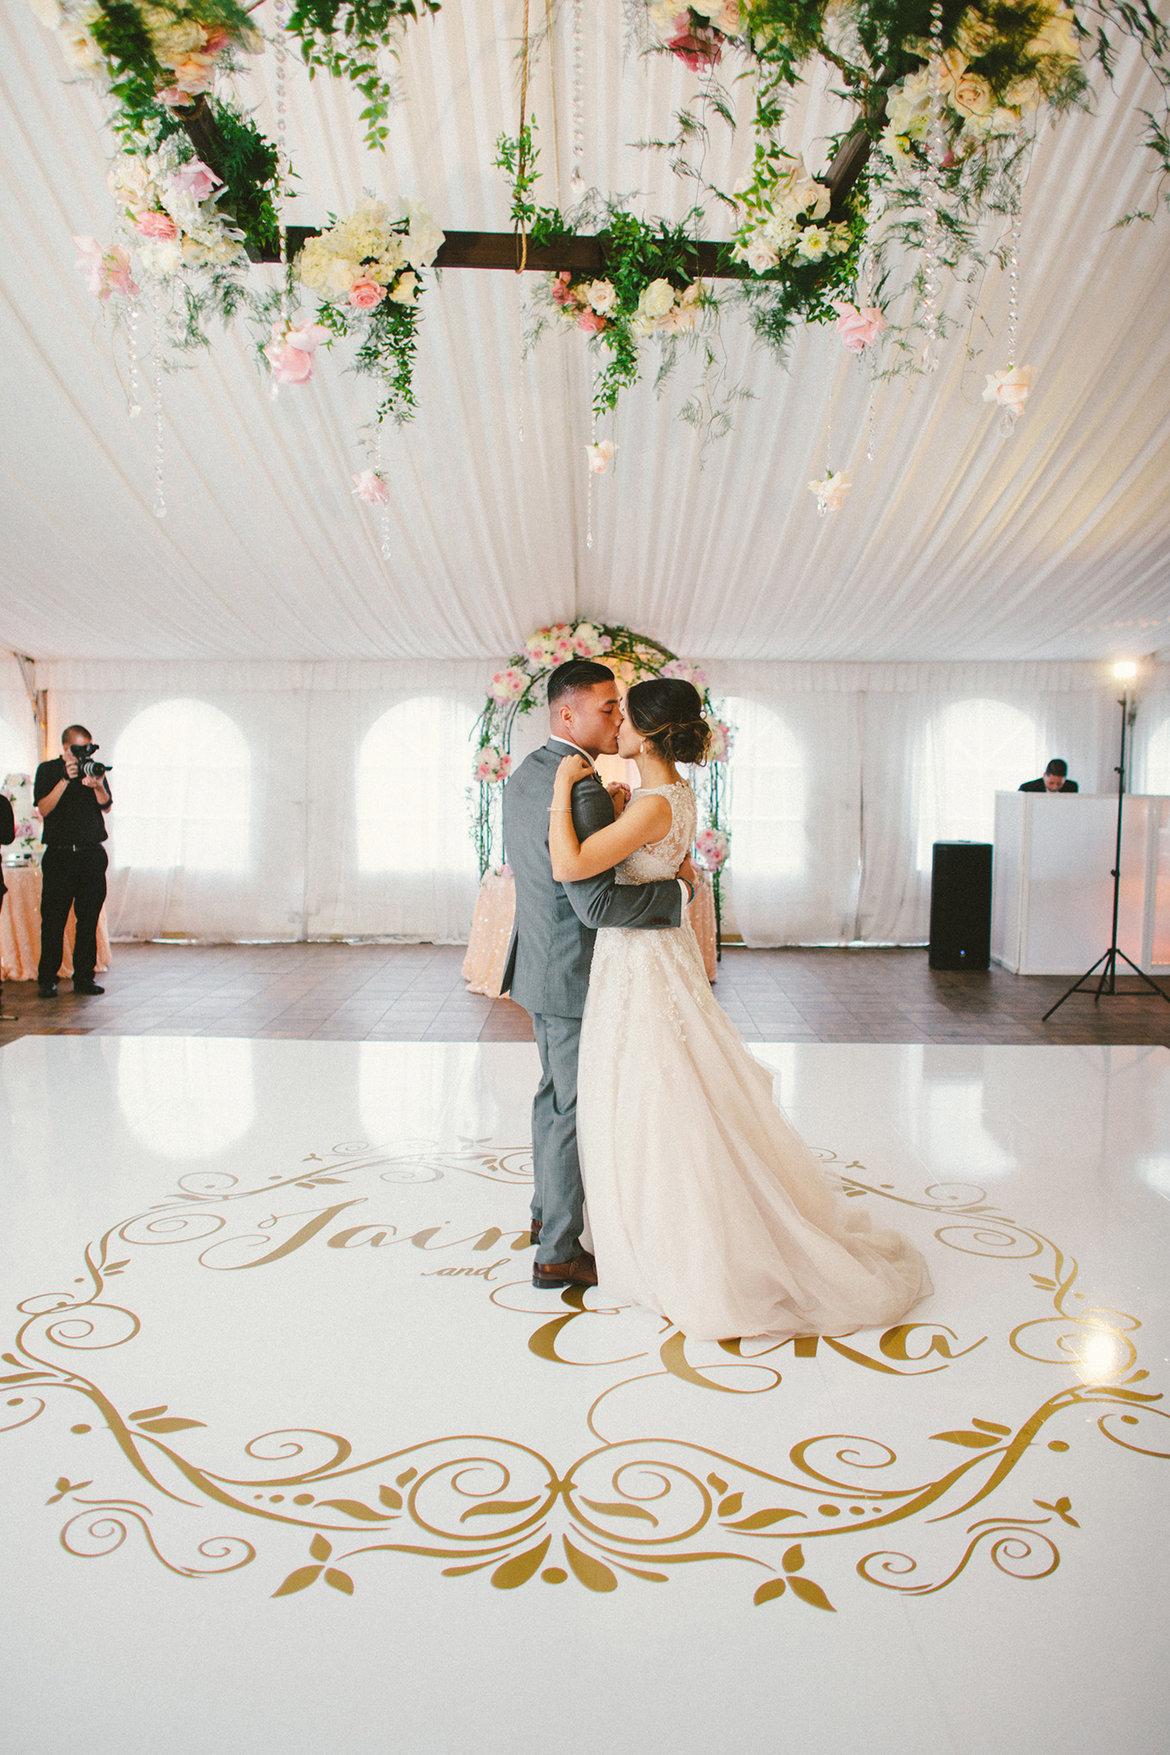 Popular Wedding Band Songs